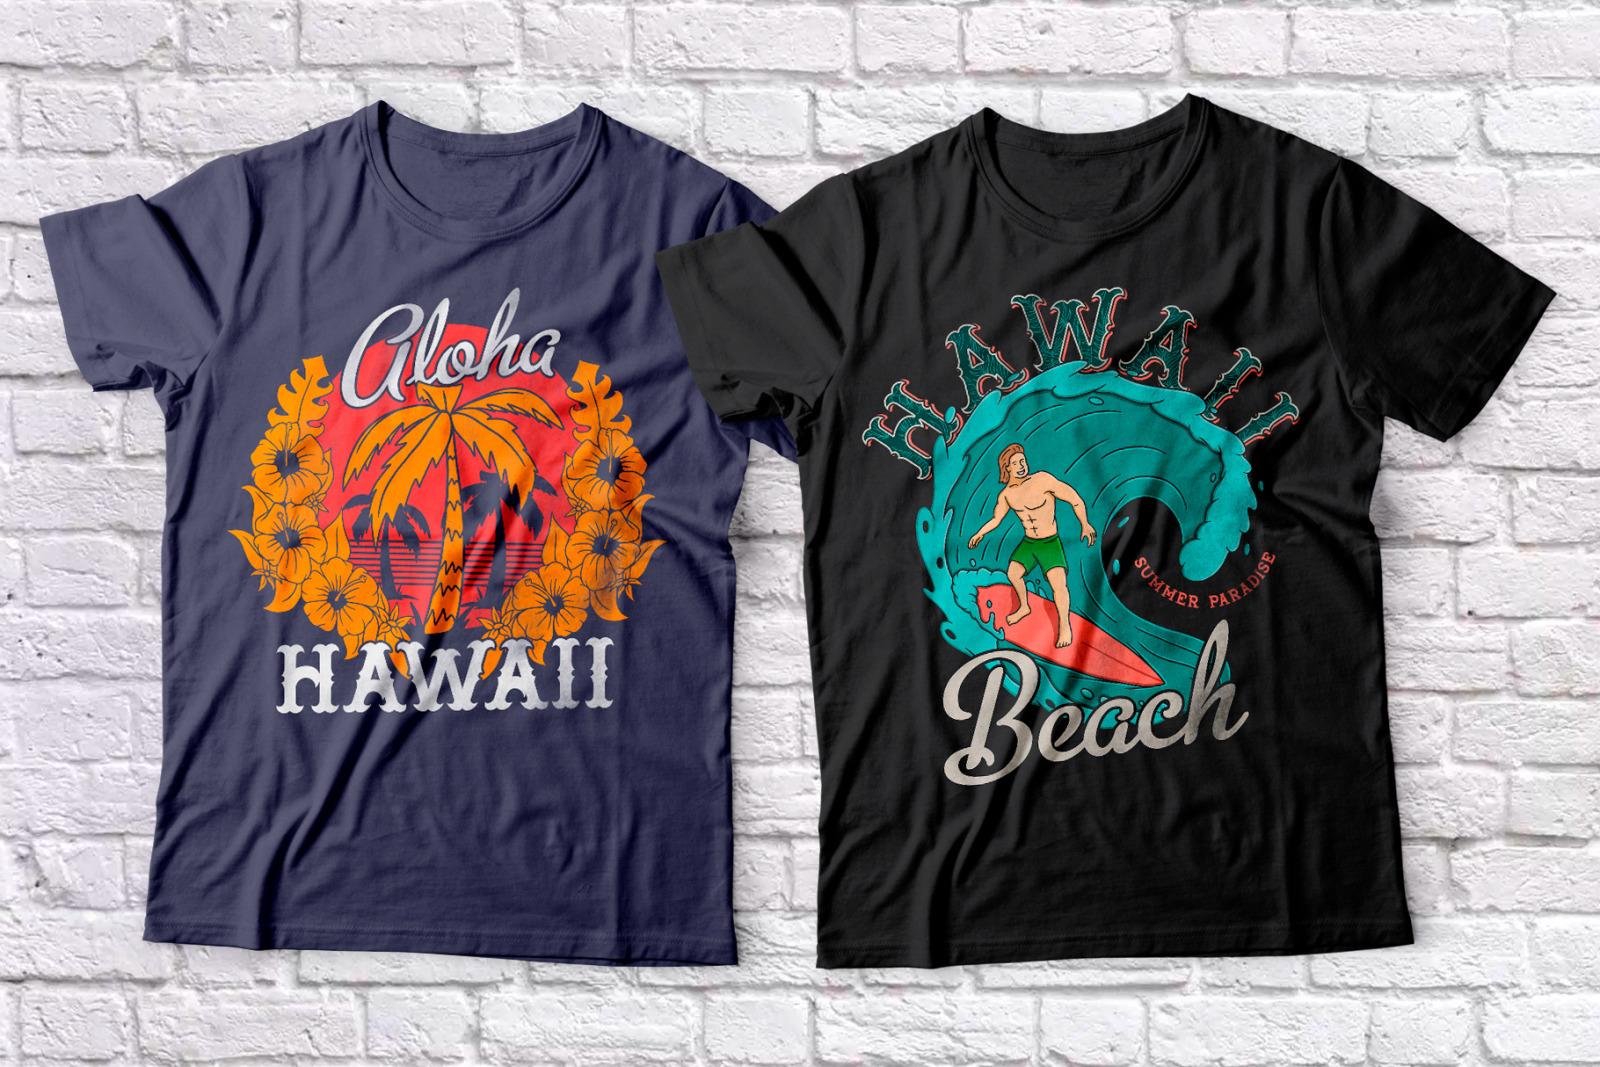 Hawaii Beach. Font & T-shirts